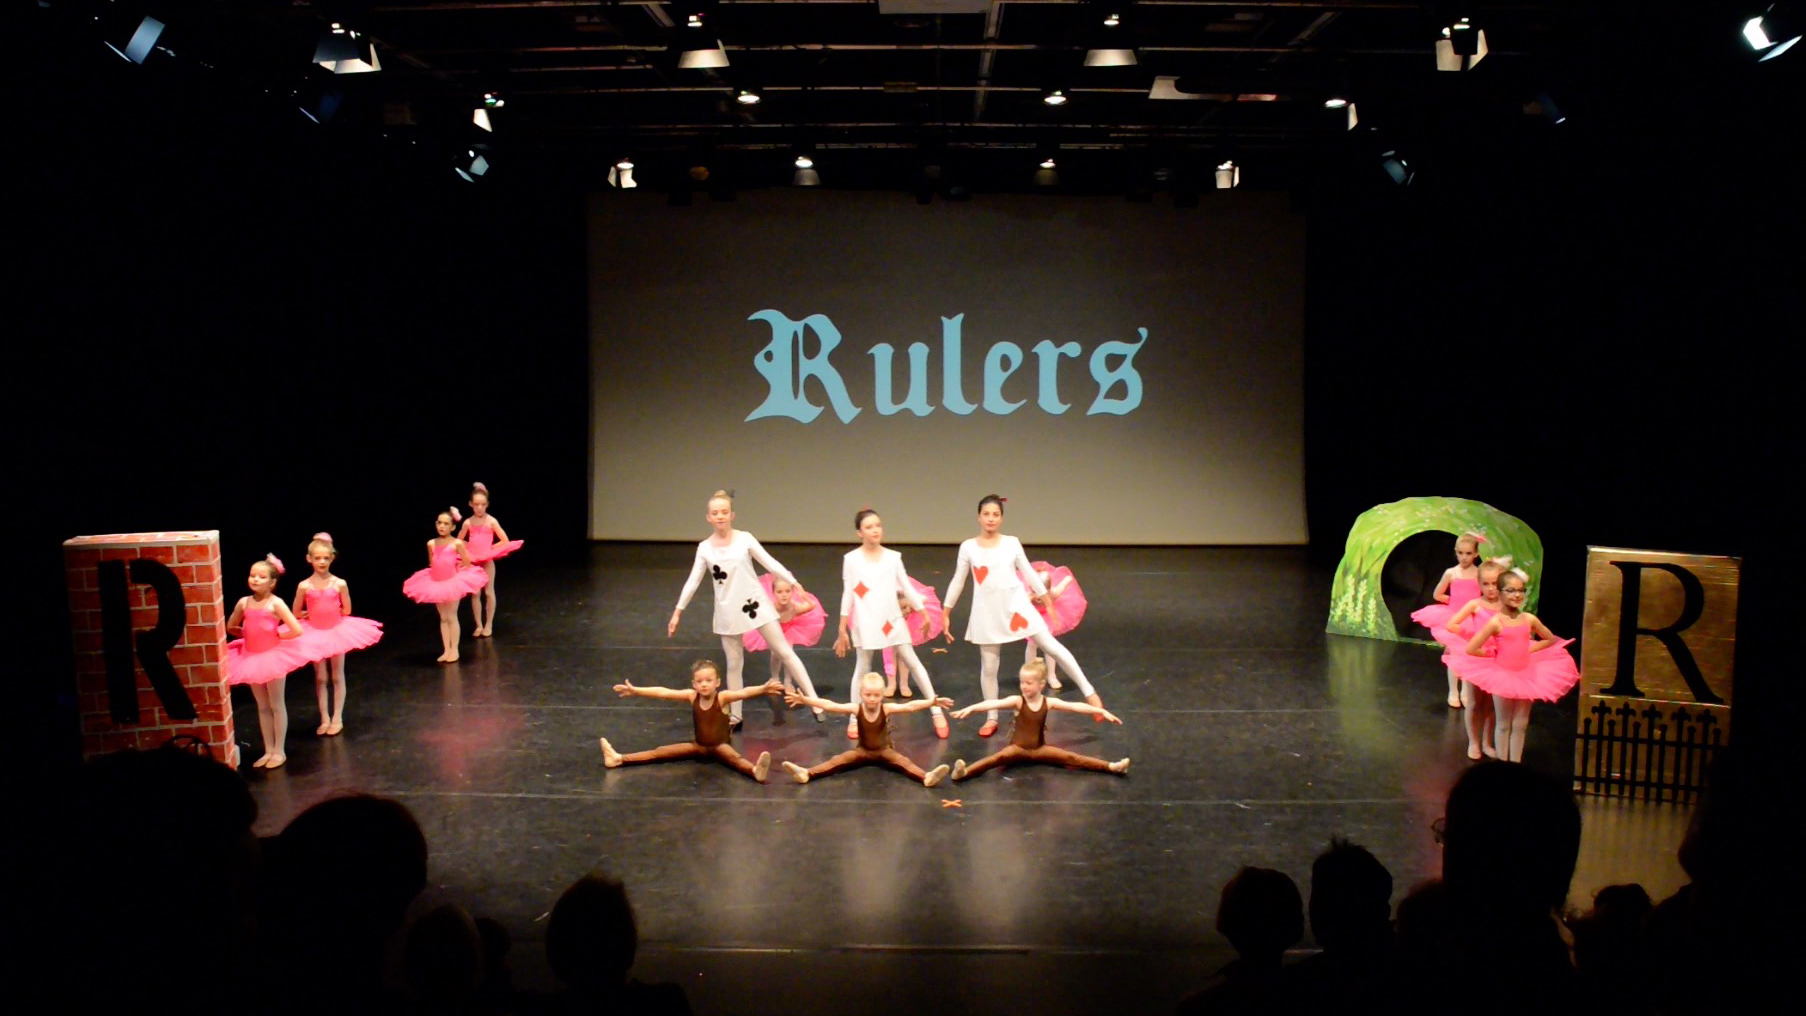 Rebels + Rulers